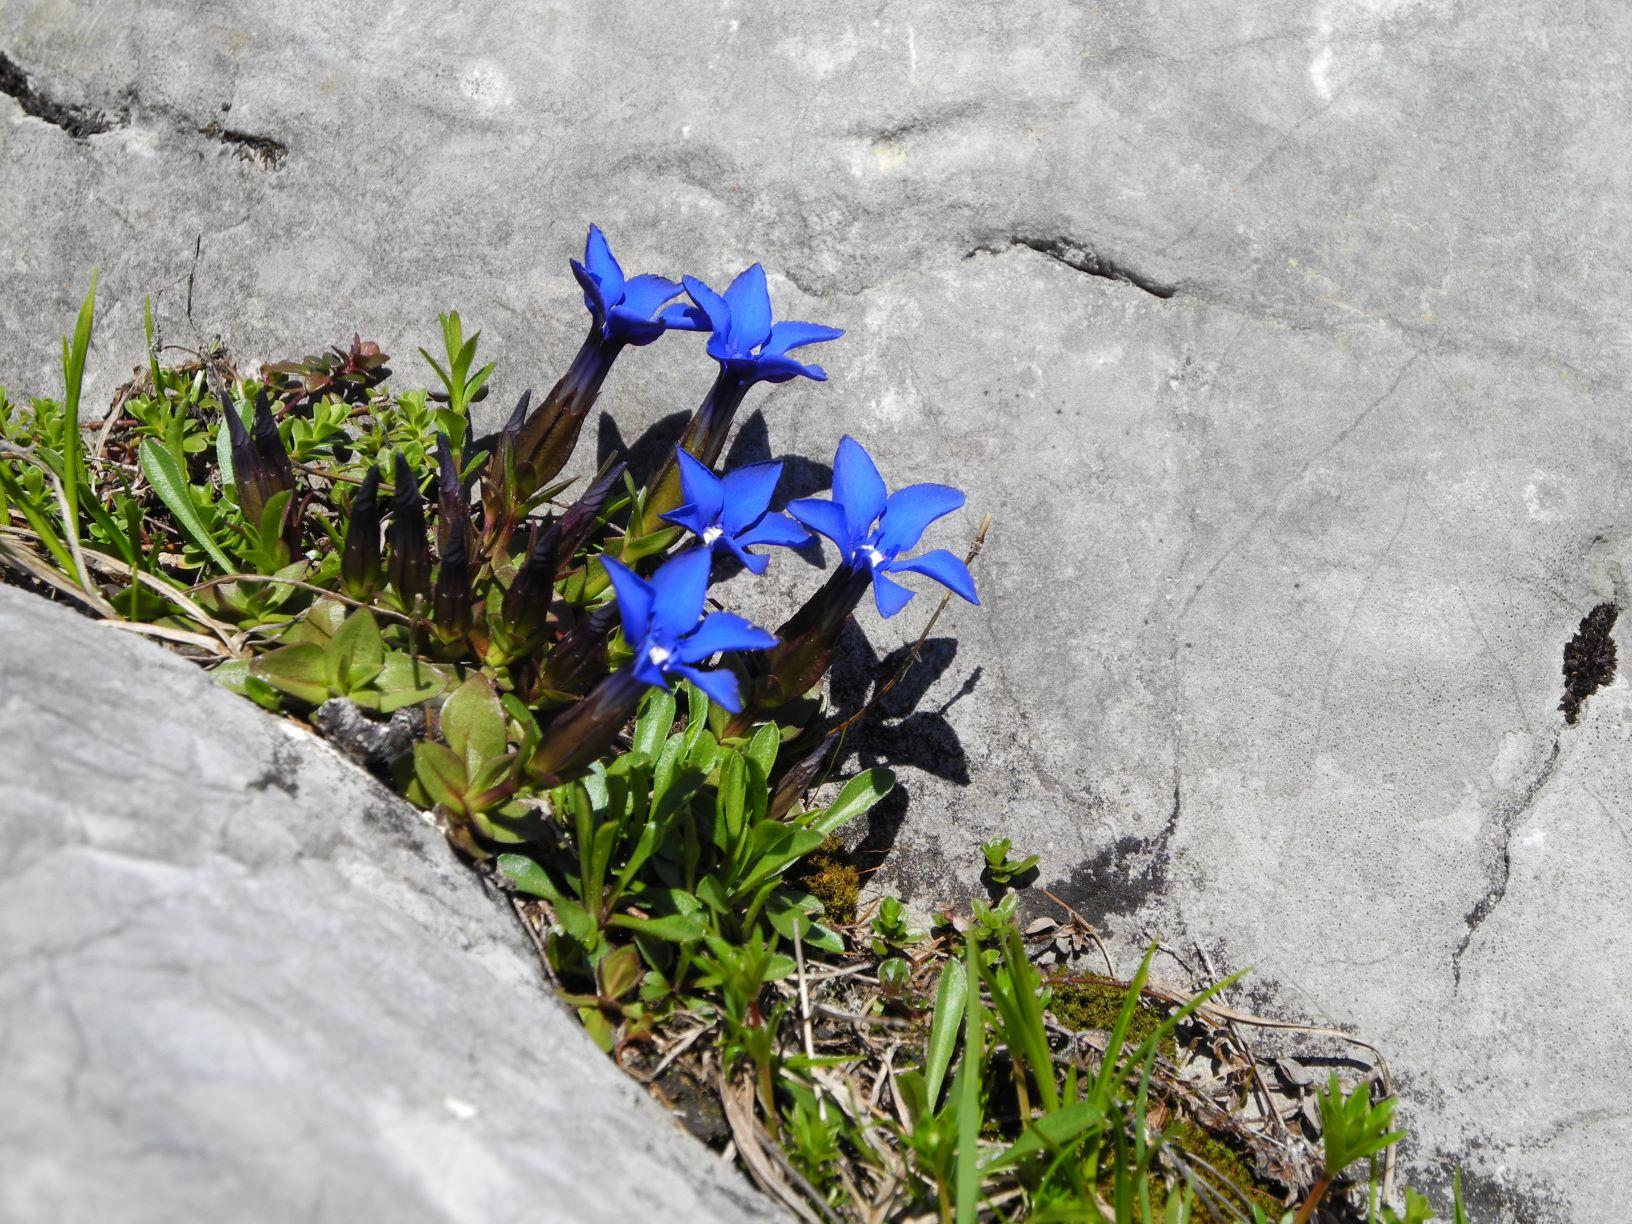 Etappe 25: Pühringerhütte – Loserhütte